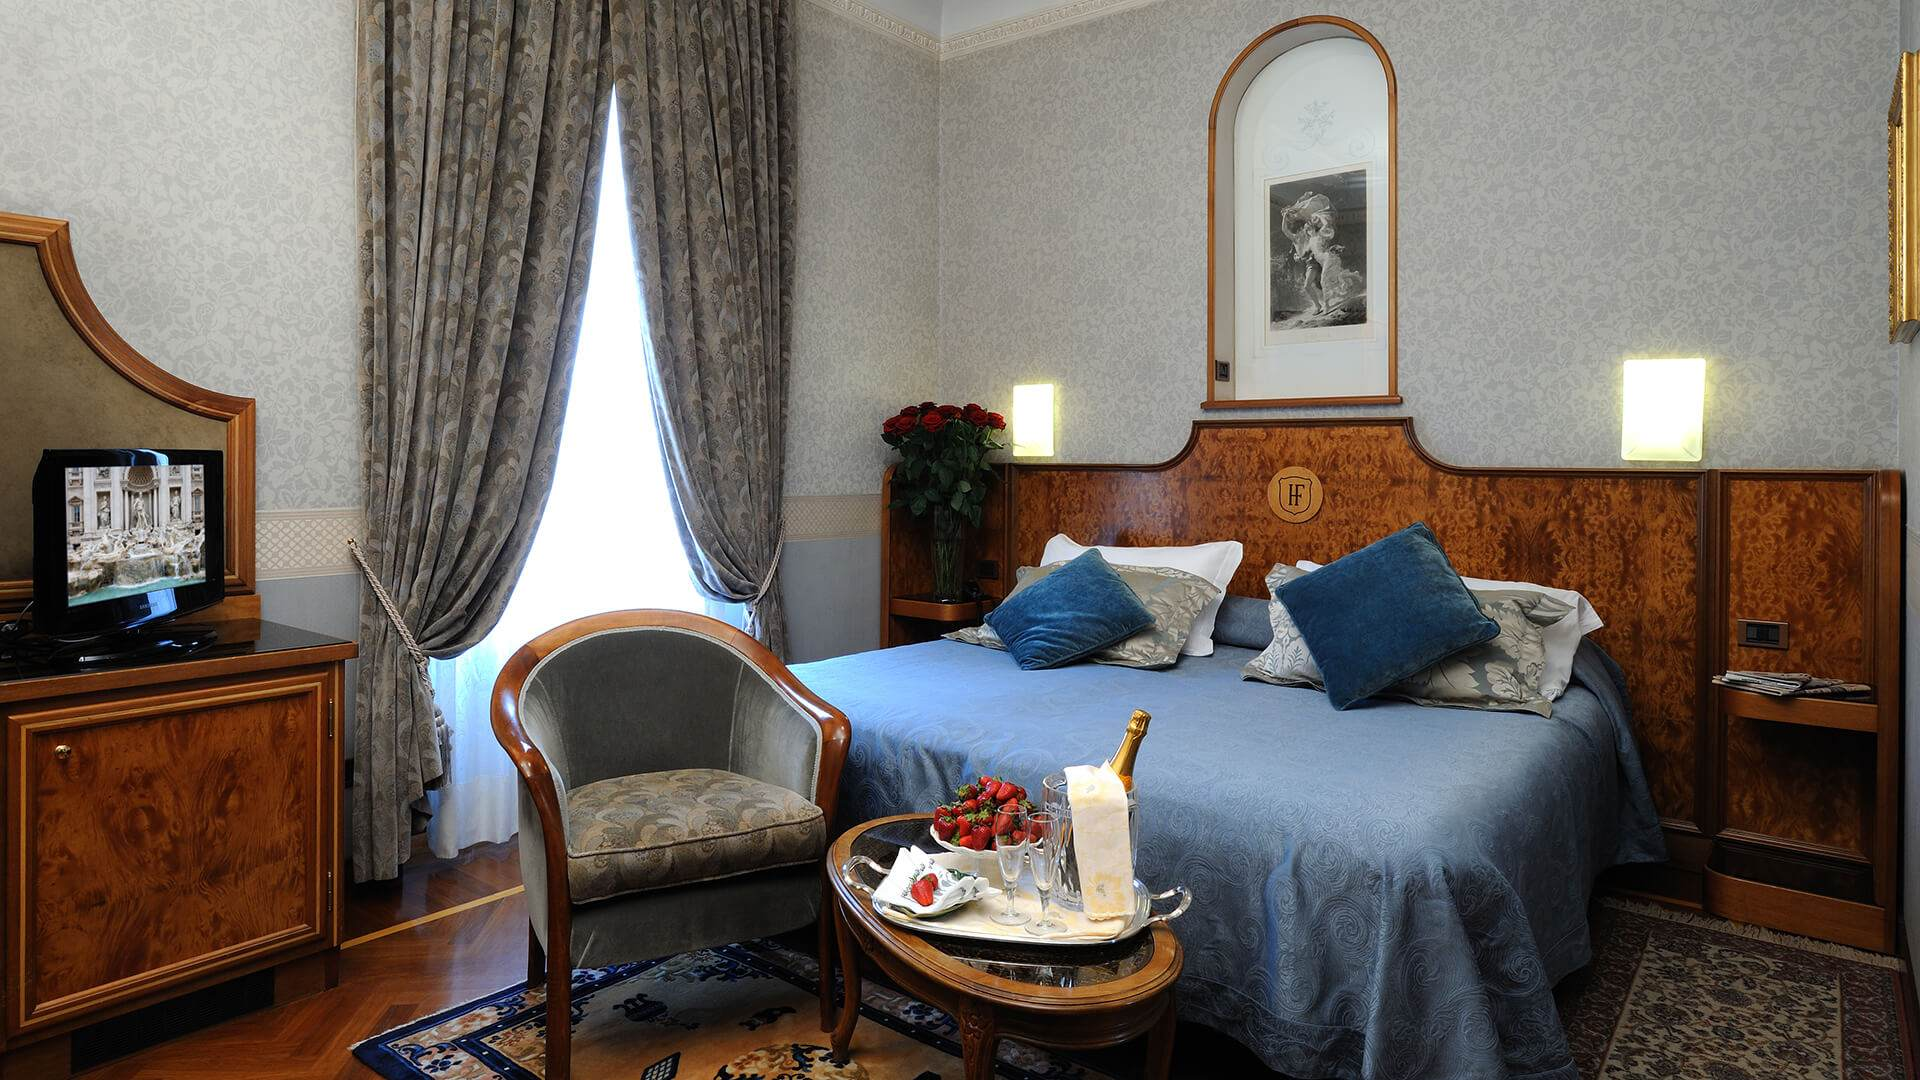 H tel de charme rome hotel farnese site officiel - Hotel de charme rome ...